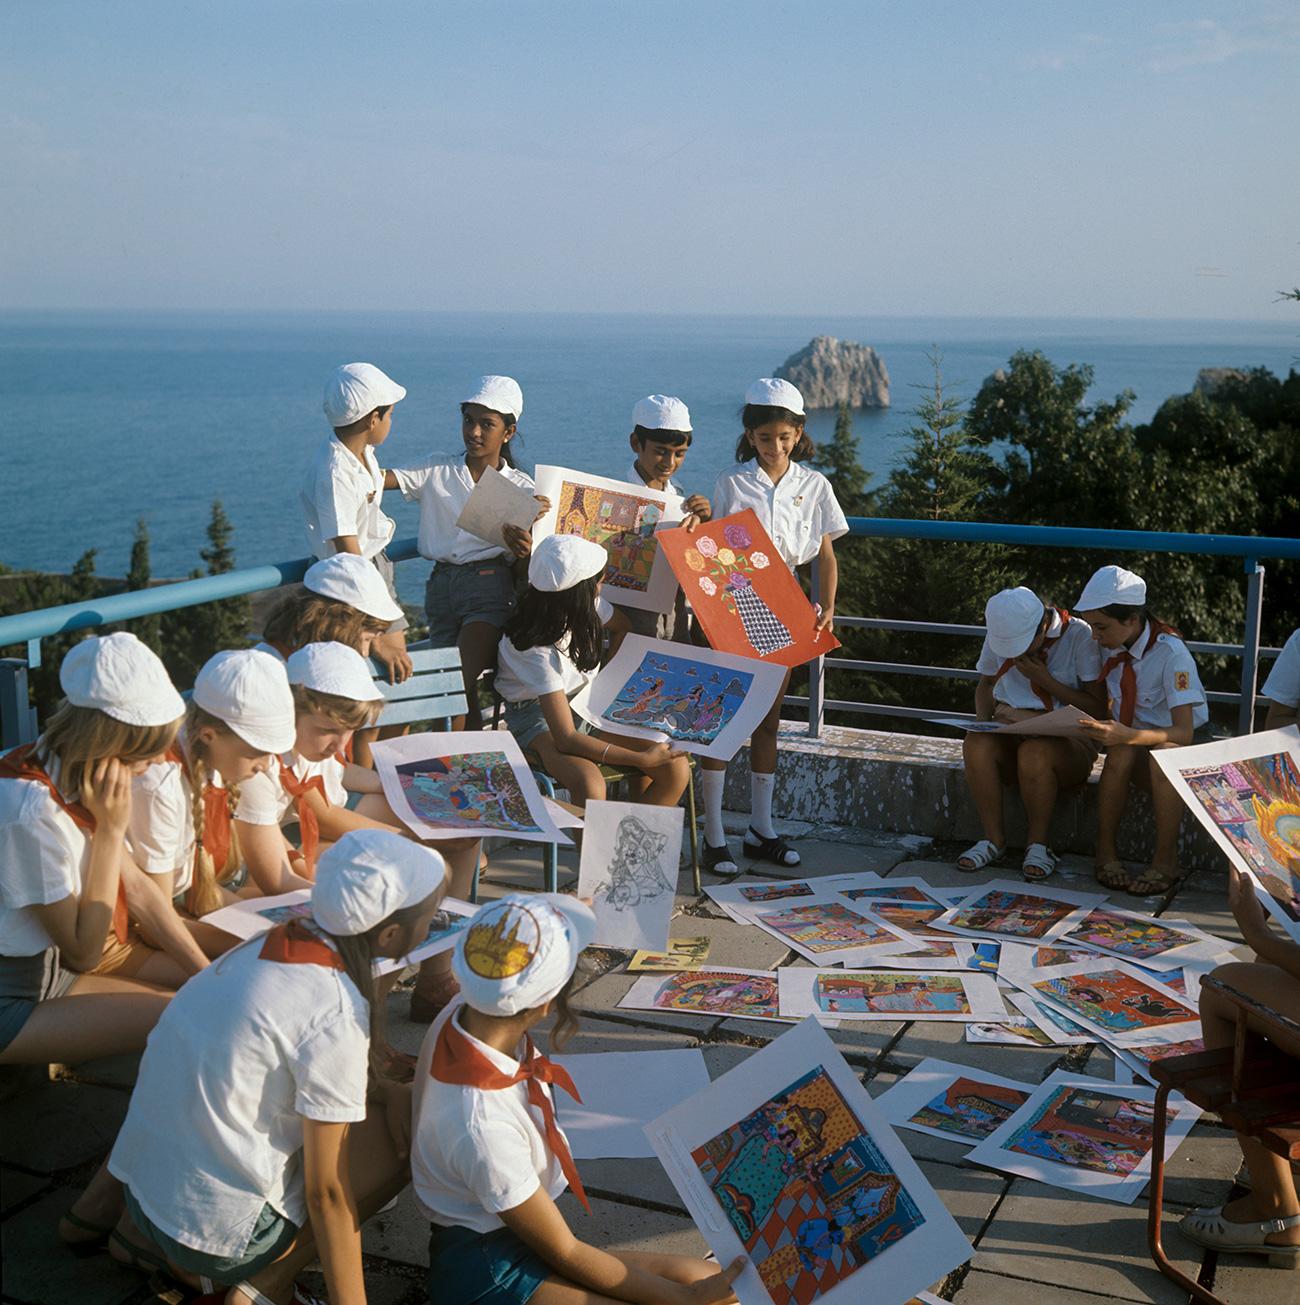 "Kamp ""Artek"" Persatuan Seluruh Pionir di Krimea. Para pelukis muda bersiap untuk festival seni. 1975. Sumber: Runov / RIA Novosti"